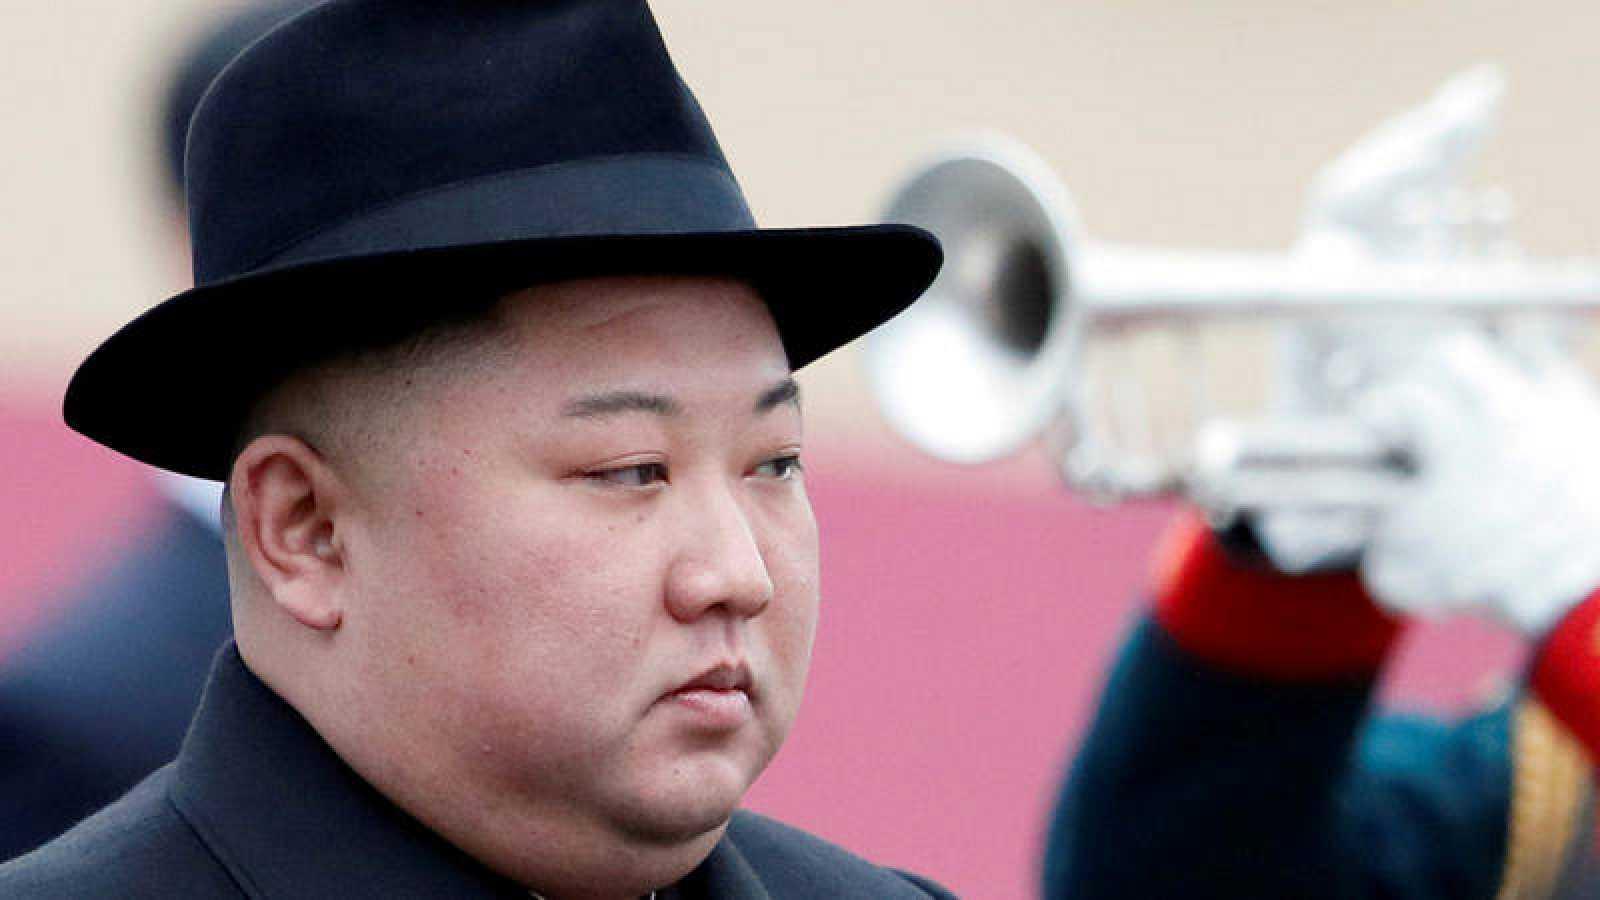 El líder norcoreano Kim Jong-un